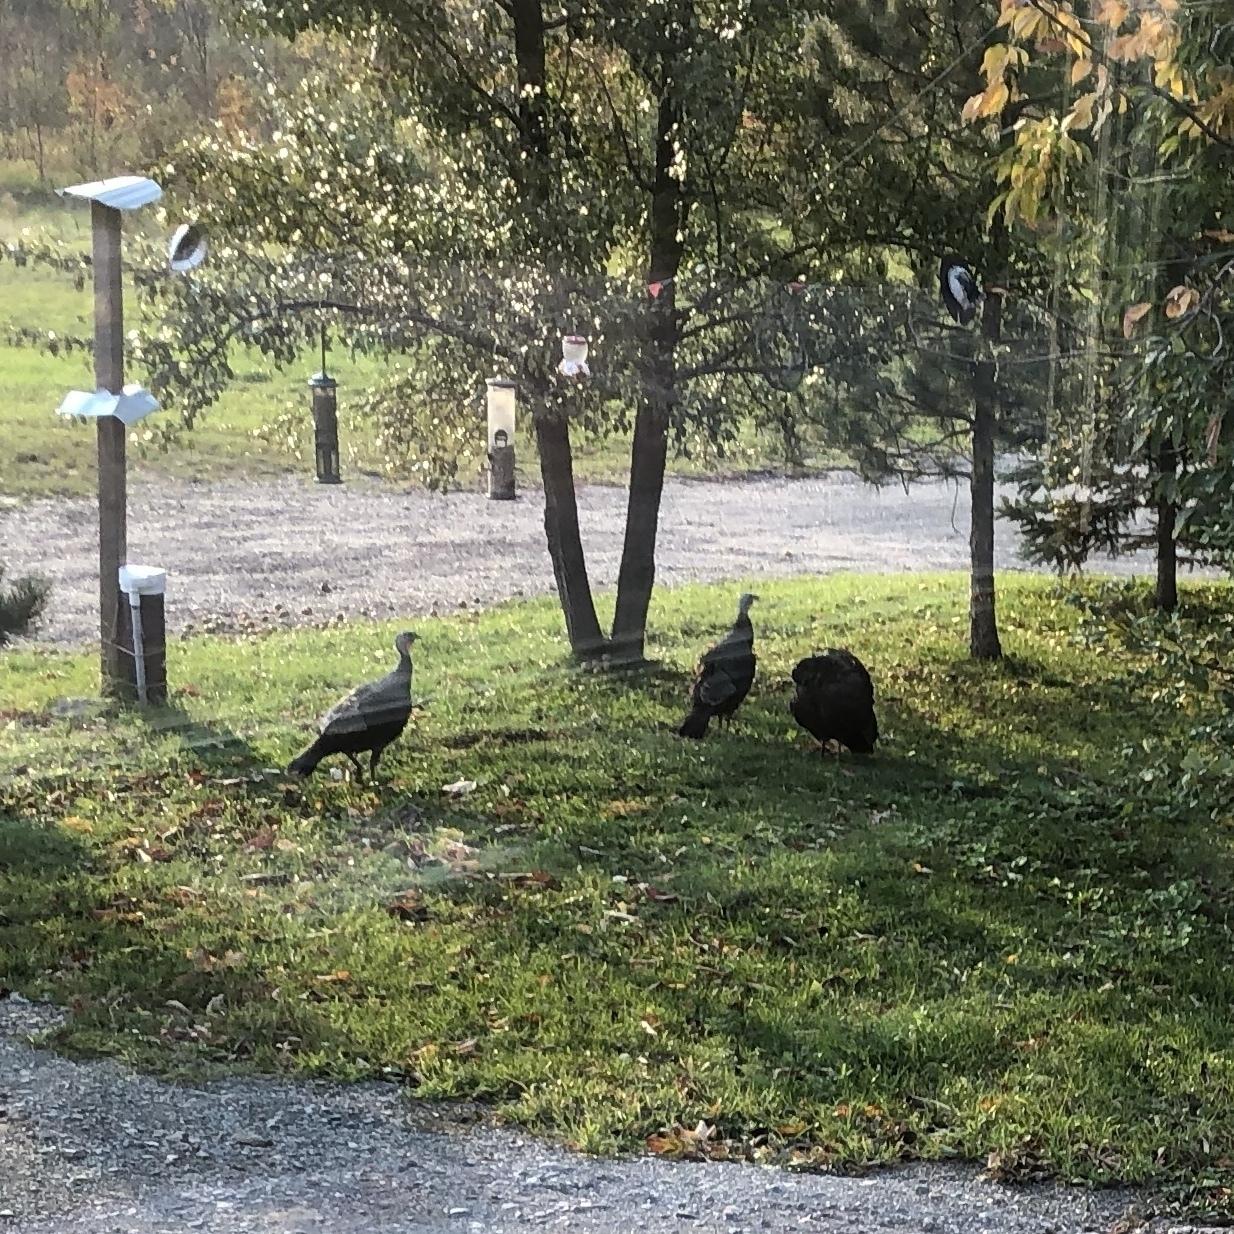 3 wild turkeys under some birdfeeders surrounded by trees